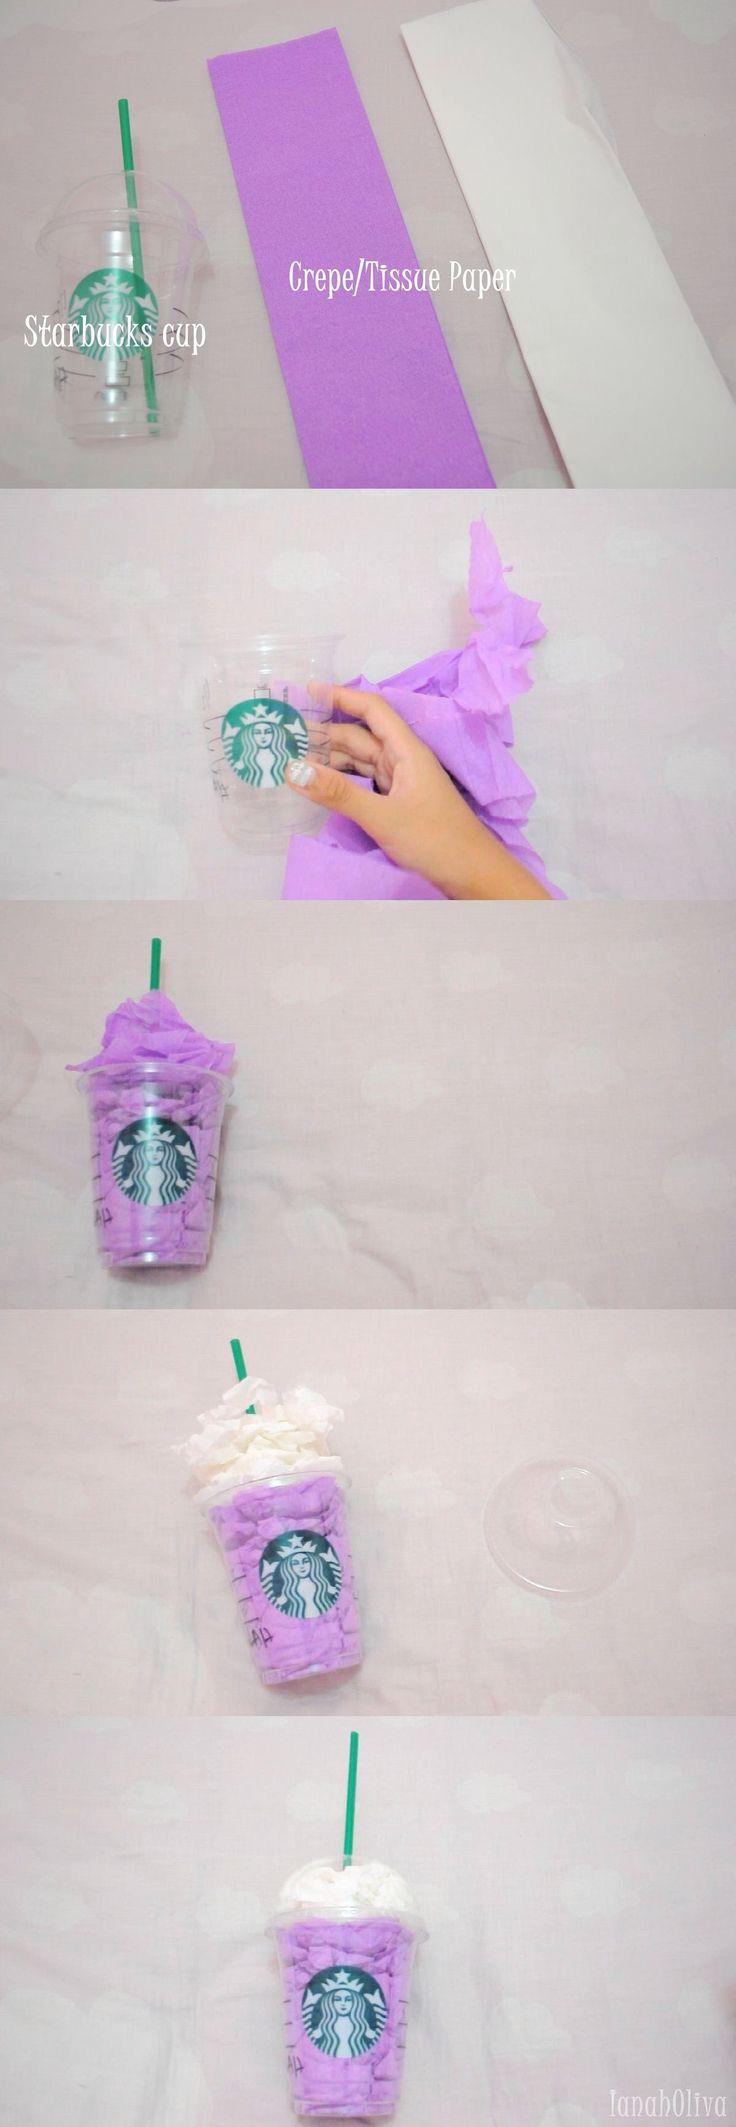 DIY Room Decor: Starbucks Cup                                 DIY Craft for teens